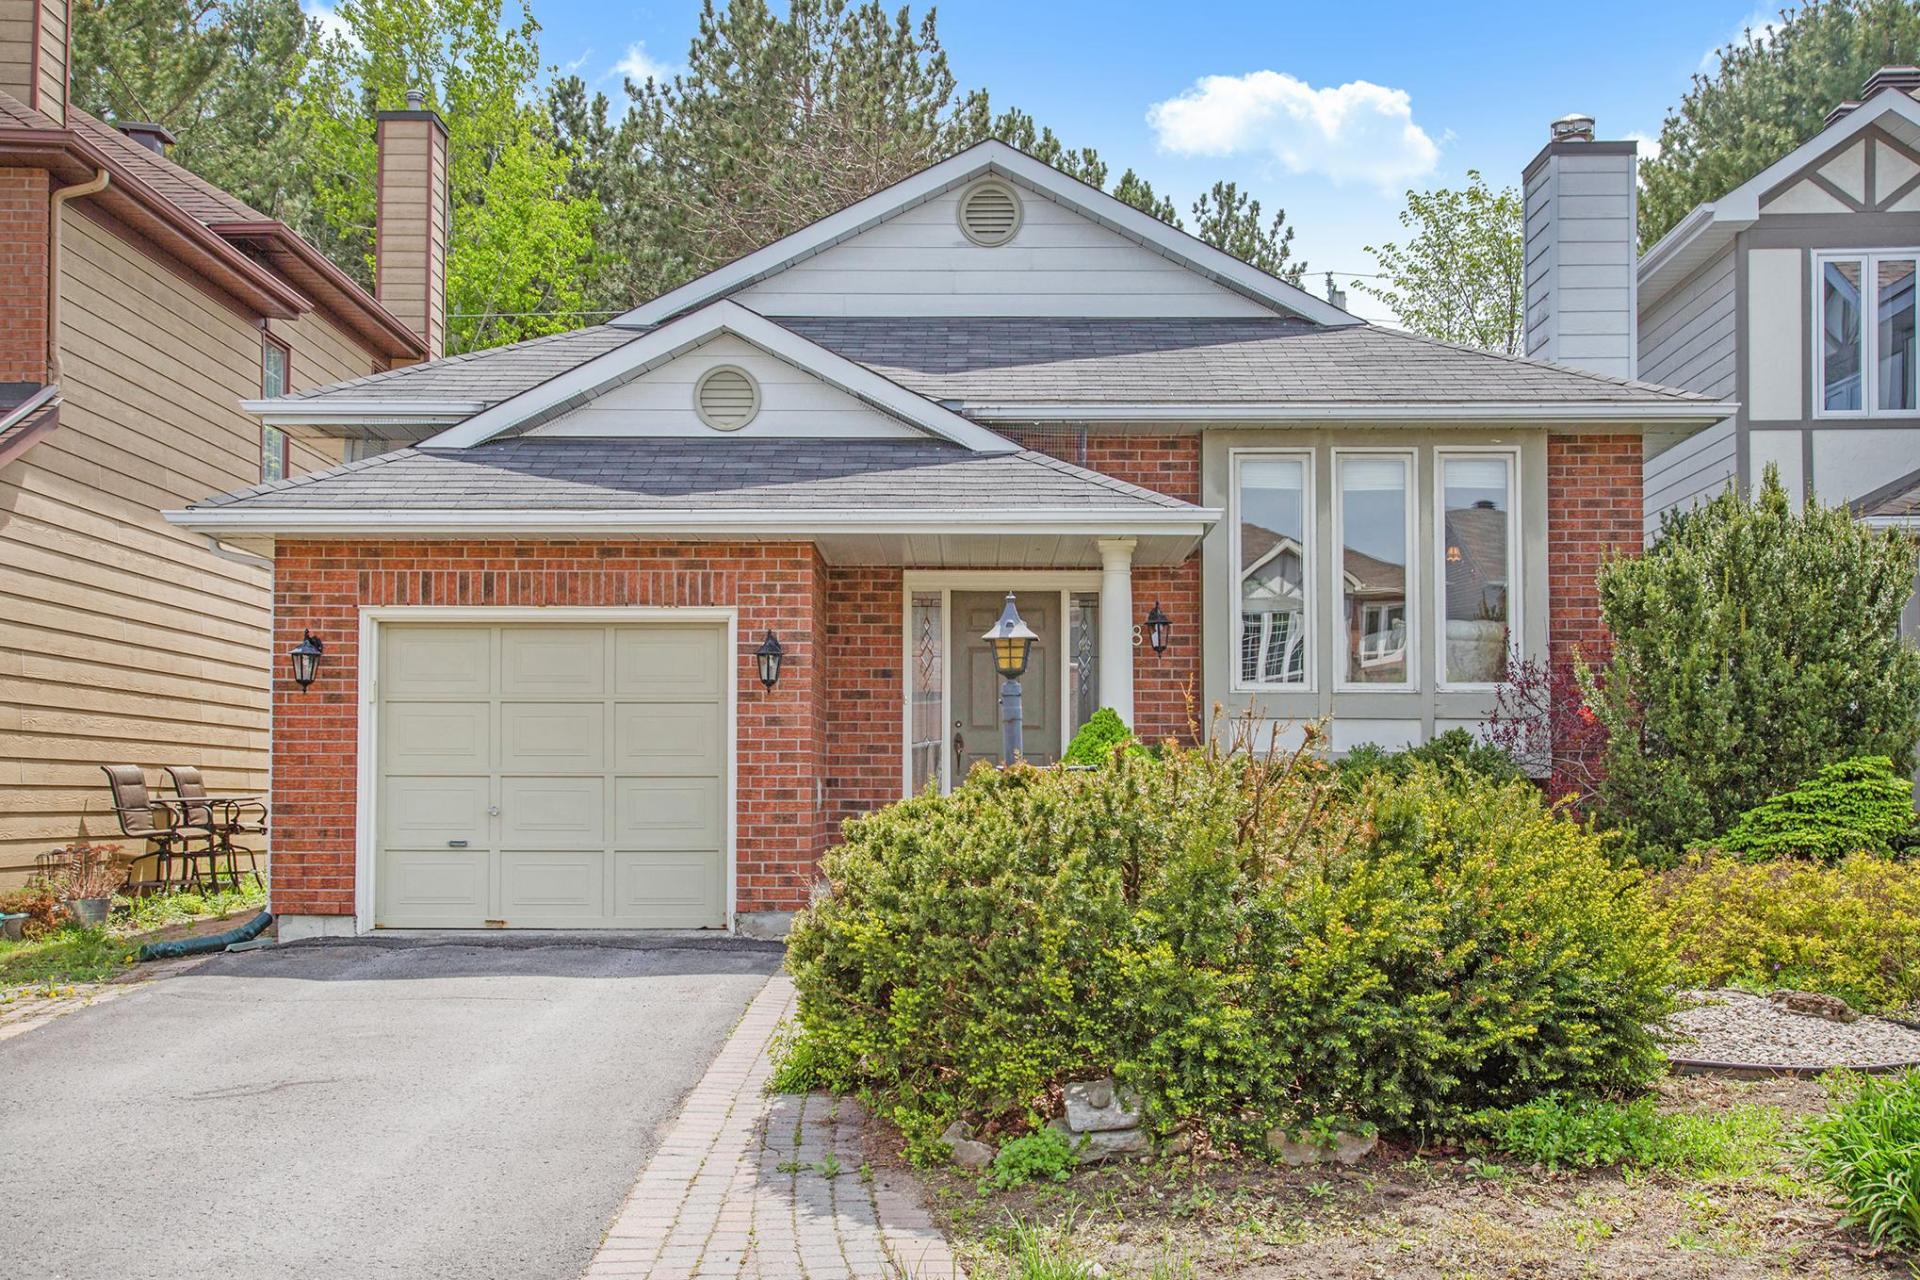 48 Forestview Crescent, Bells Corners, Ottawa